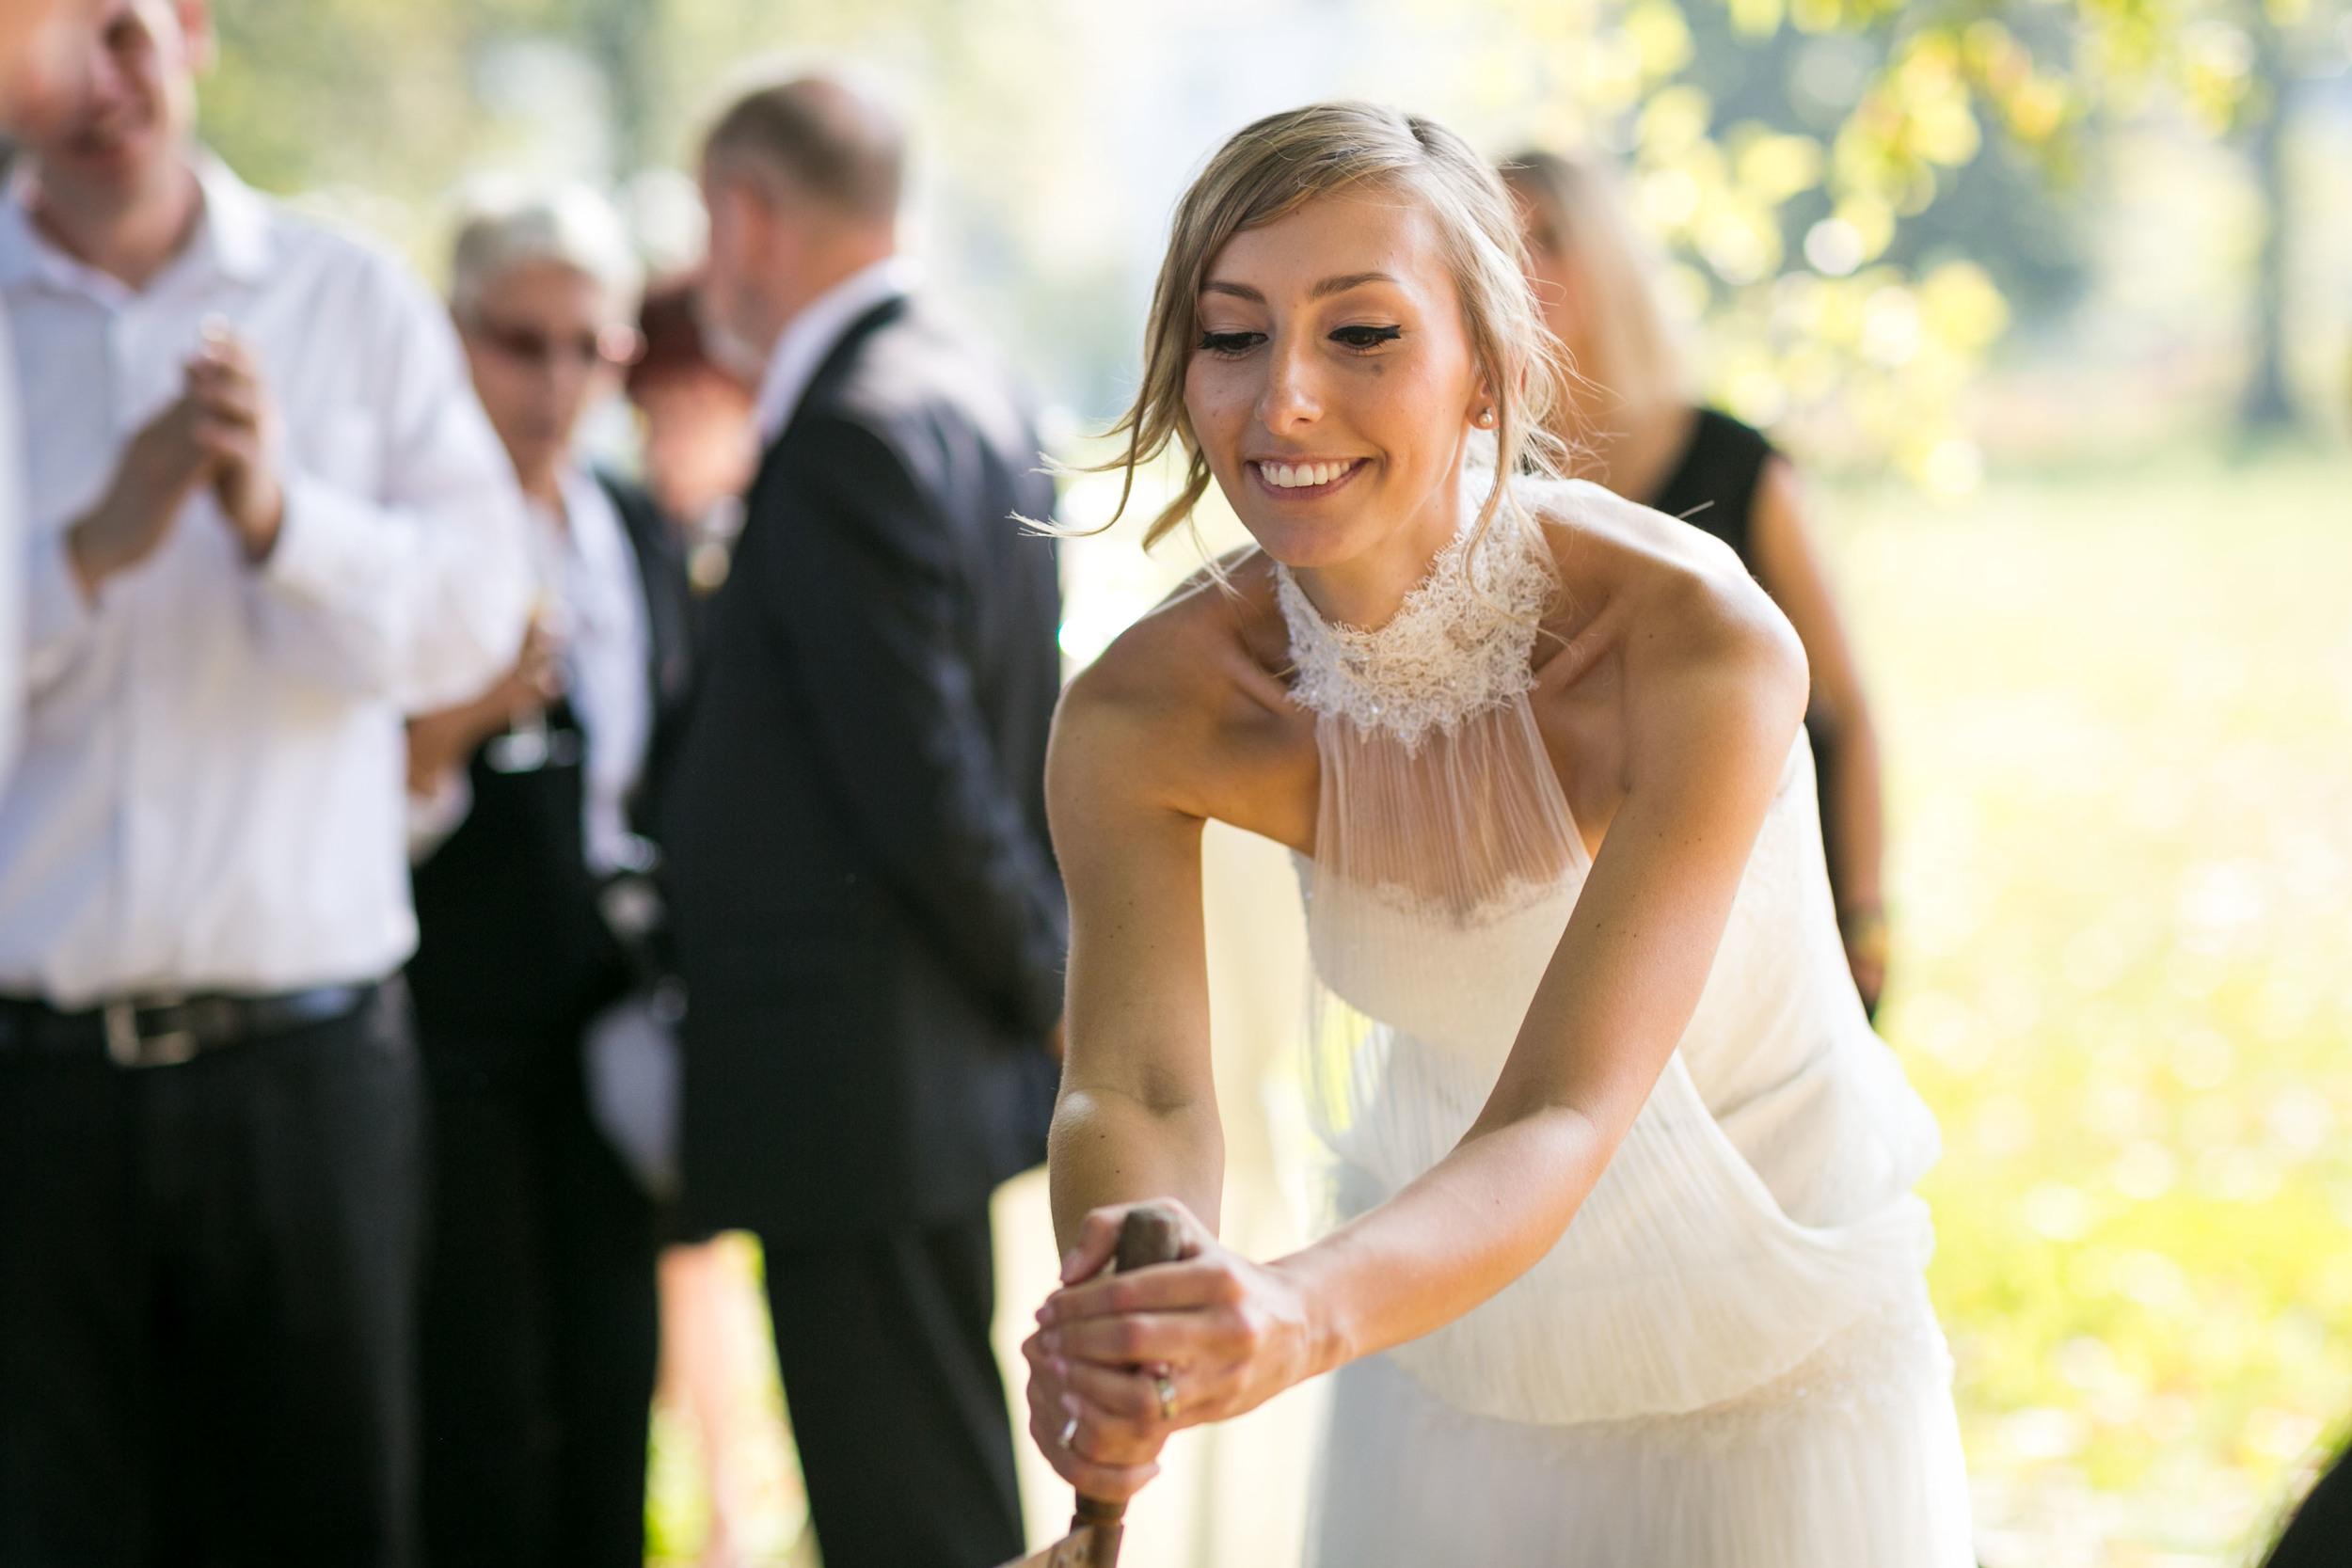 Fran Burrows Hochzeitsfotografie_Kulturgut Wrechen Hochzeit-27.jpg